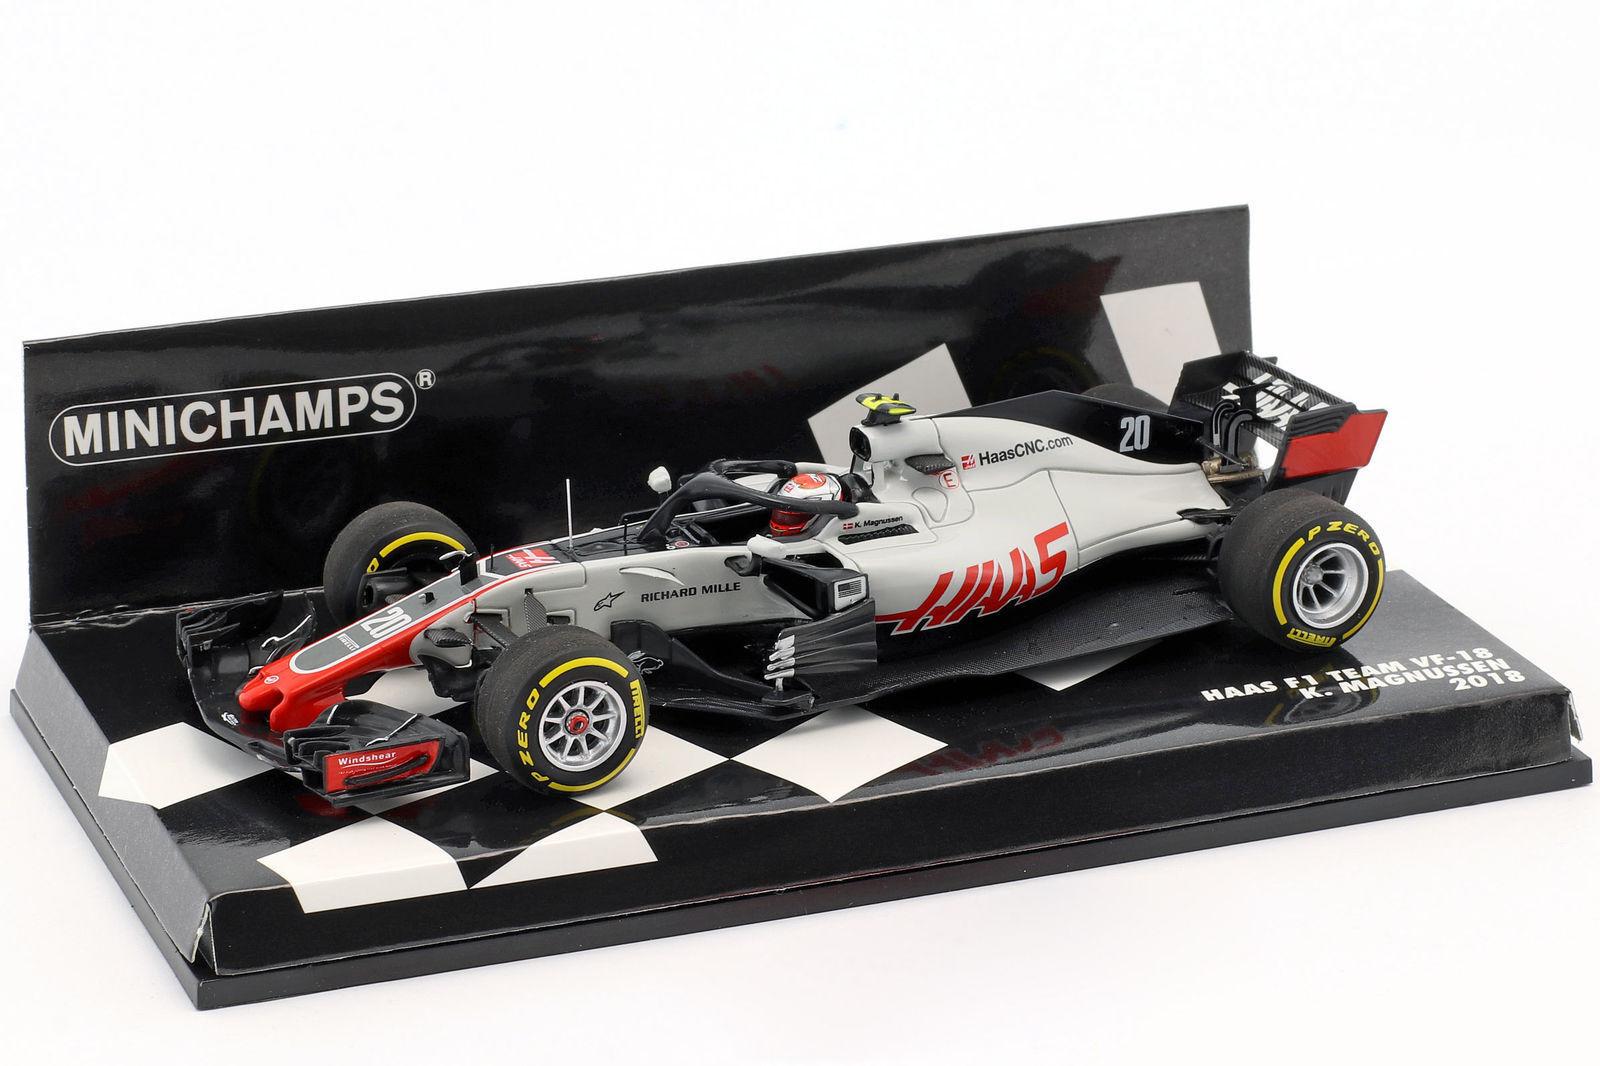 Minichamps F1 1 43rd scale Haas F1 Team VF-18 K. Magnussen 2018